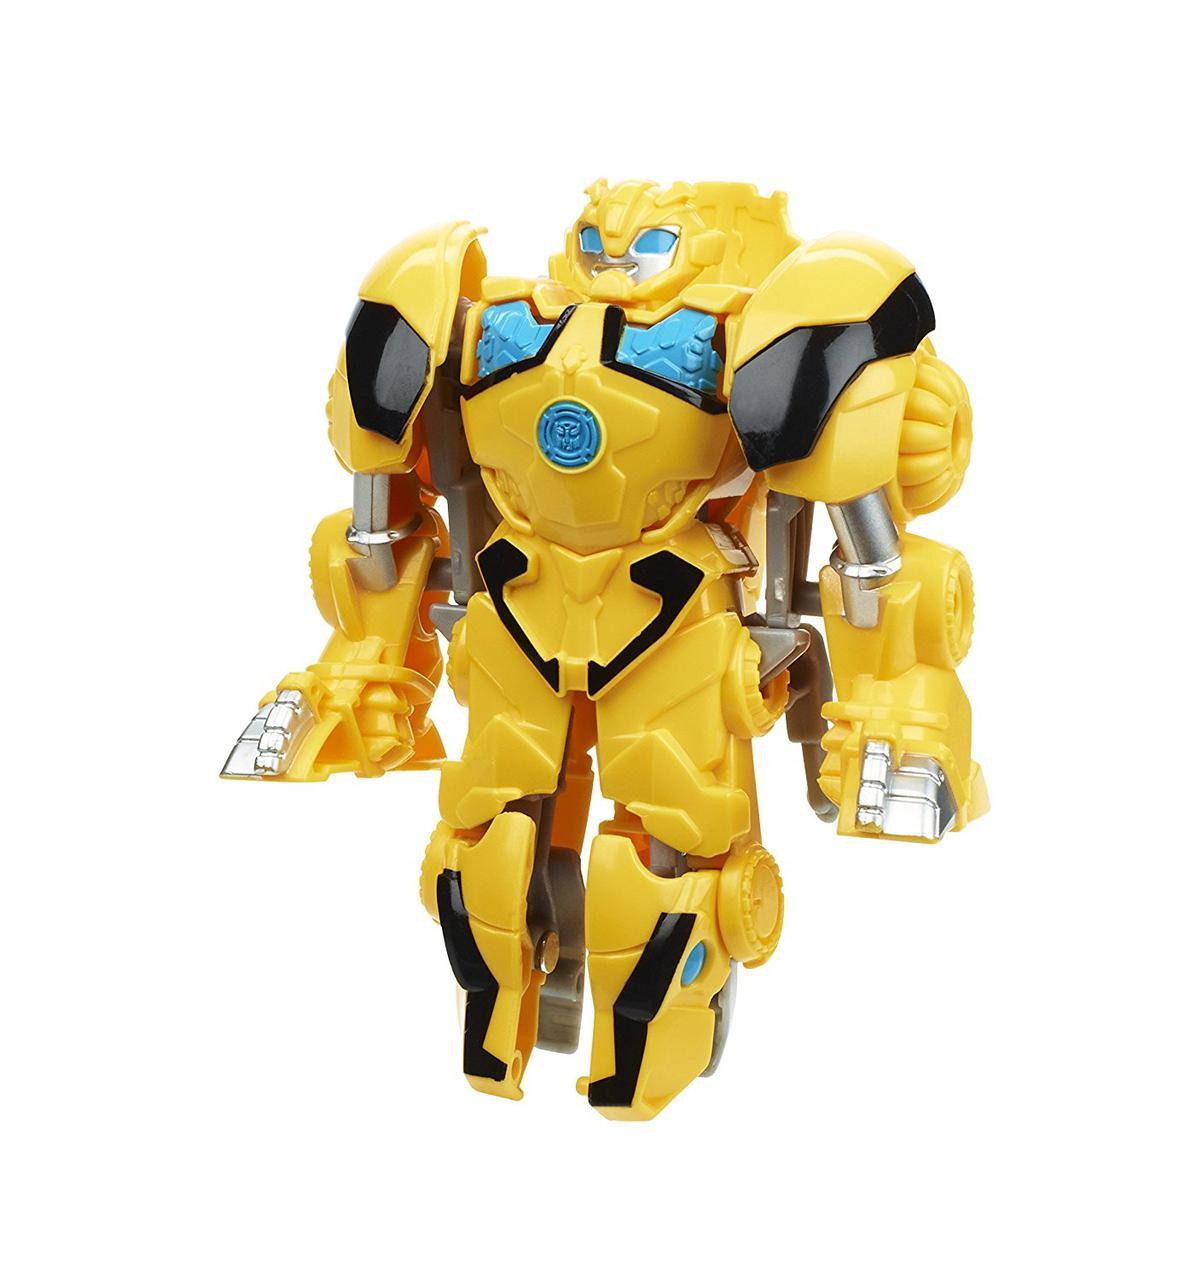 Трансформер - Playskool Heroes Transformers - Bumblebee (Бамблби) - Робот-динозавр